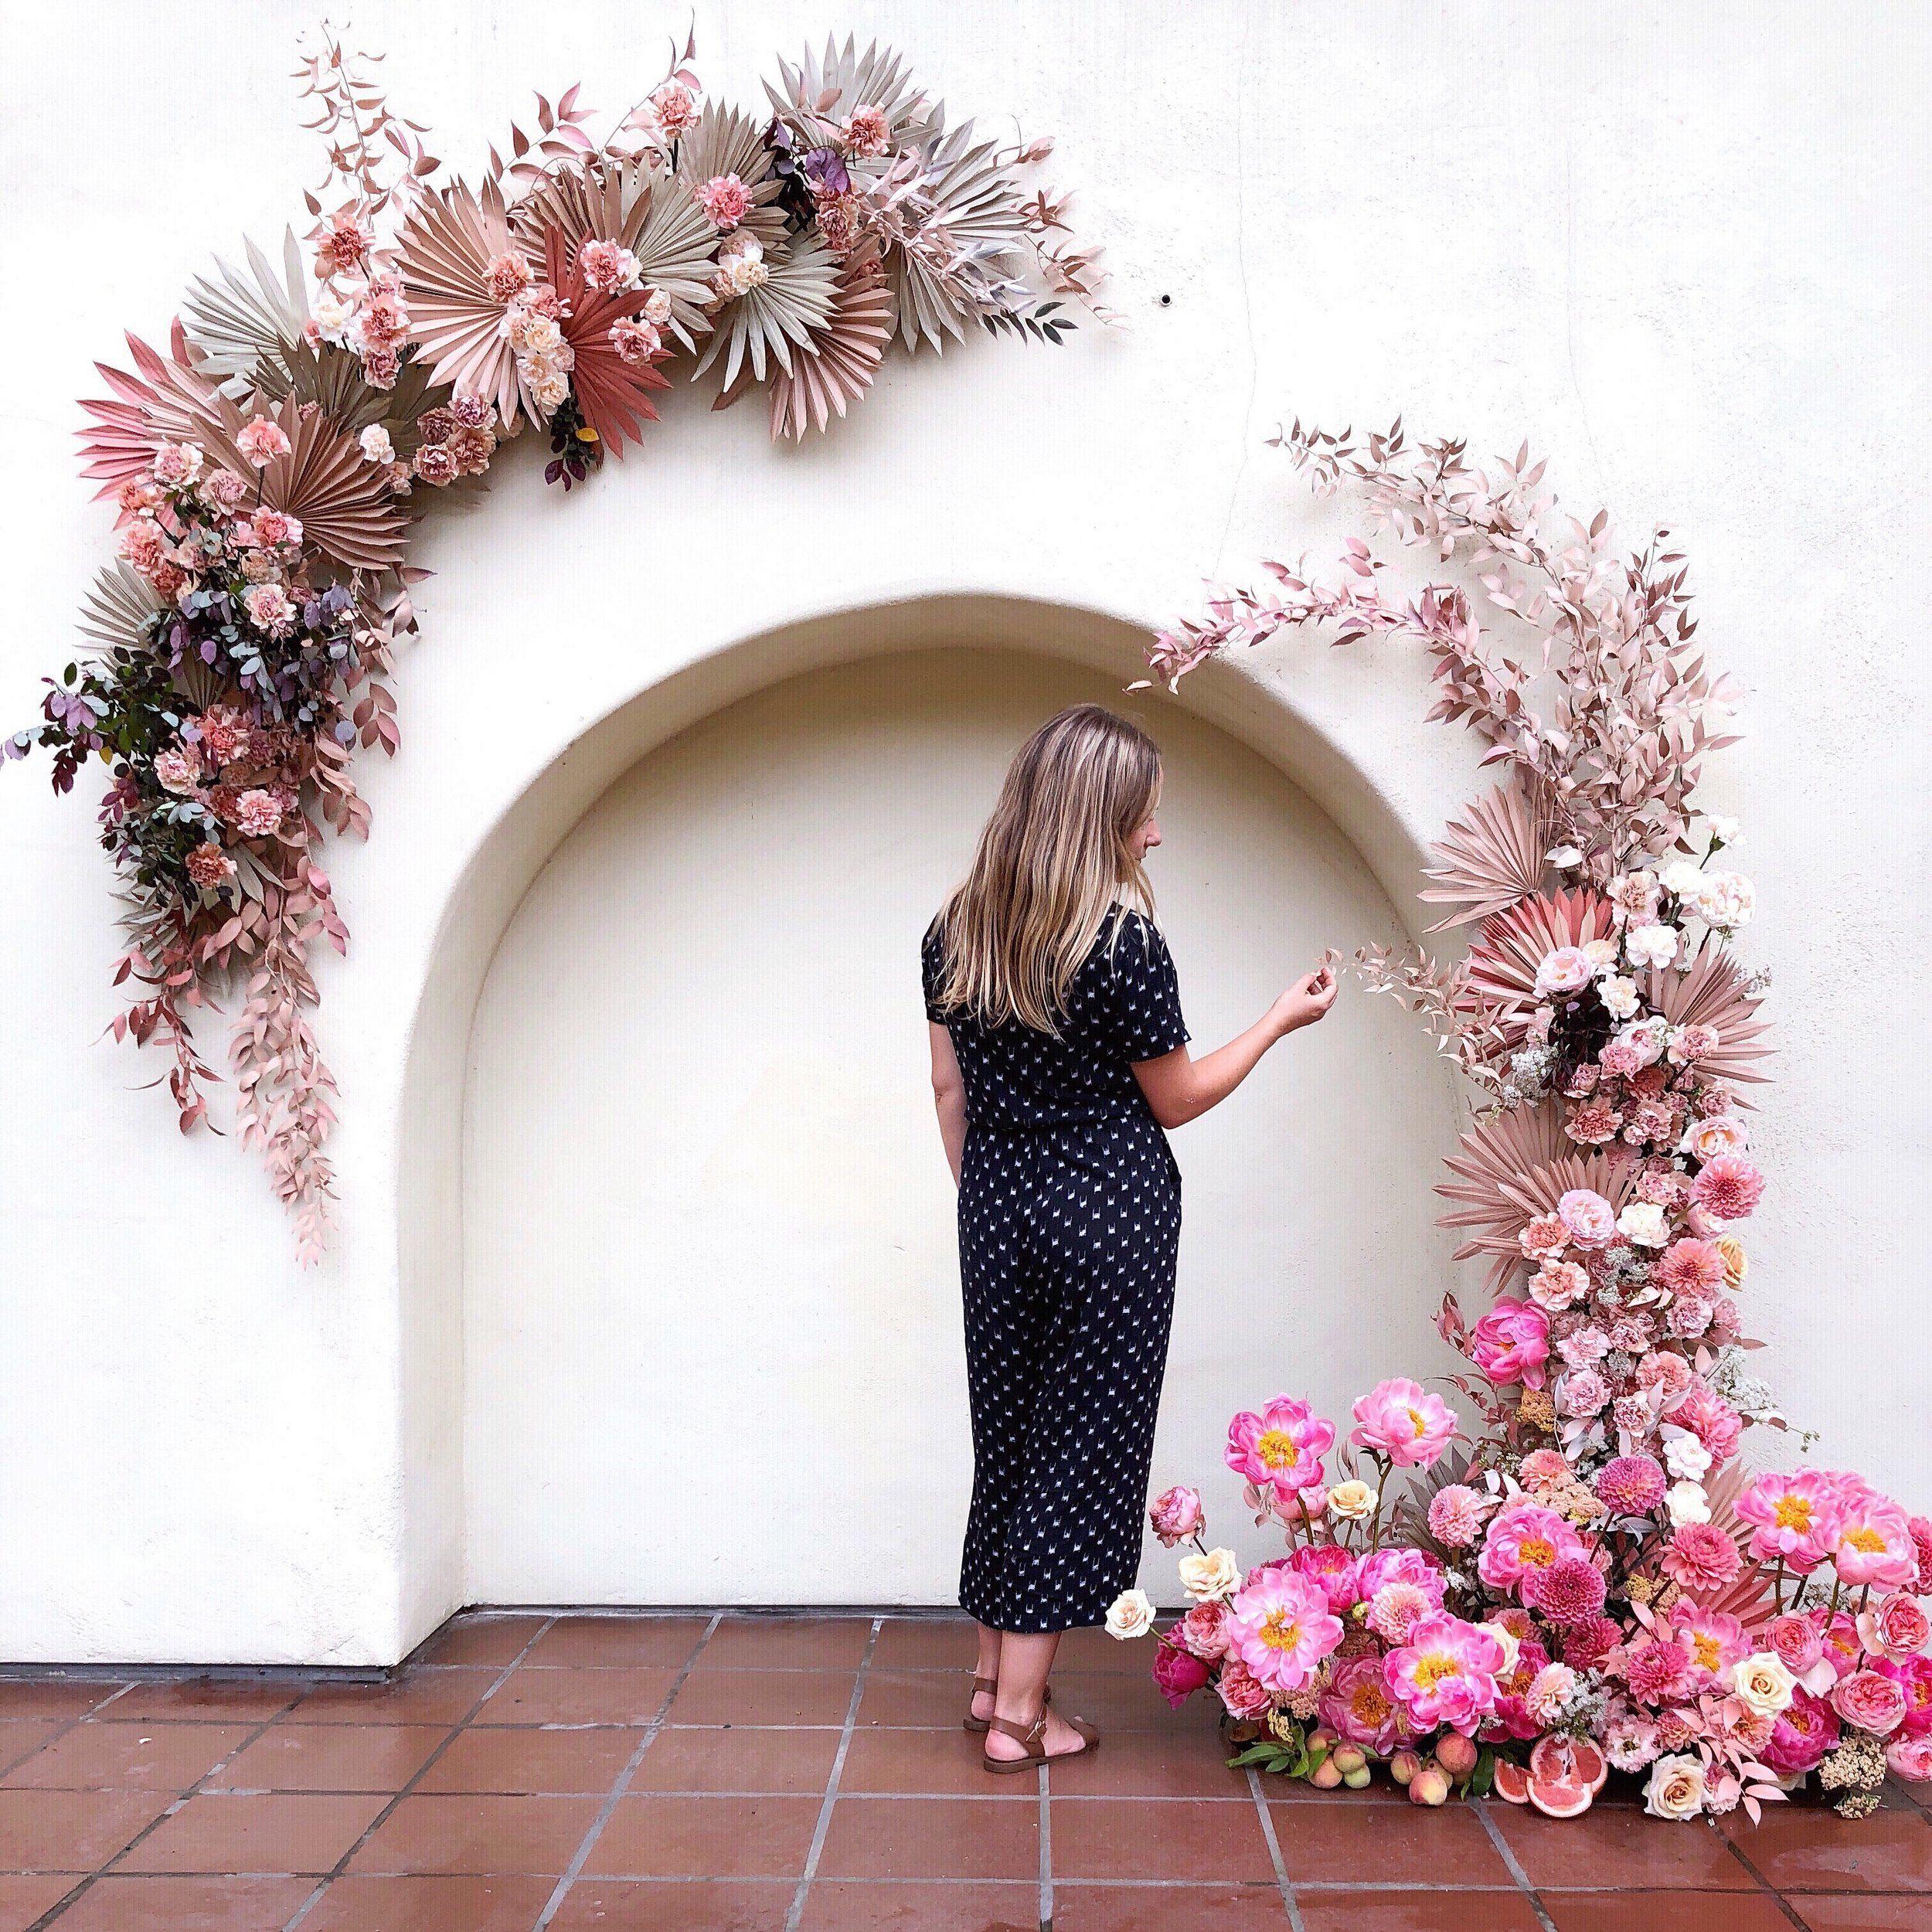 Wedding Ceremony Flowers Church: Thedaintylionfloralco. Wedding Ceremony. Floral